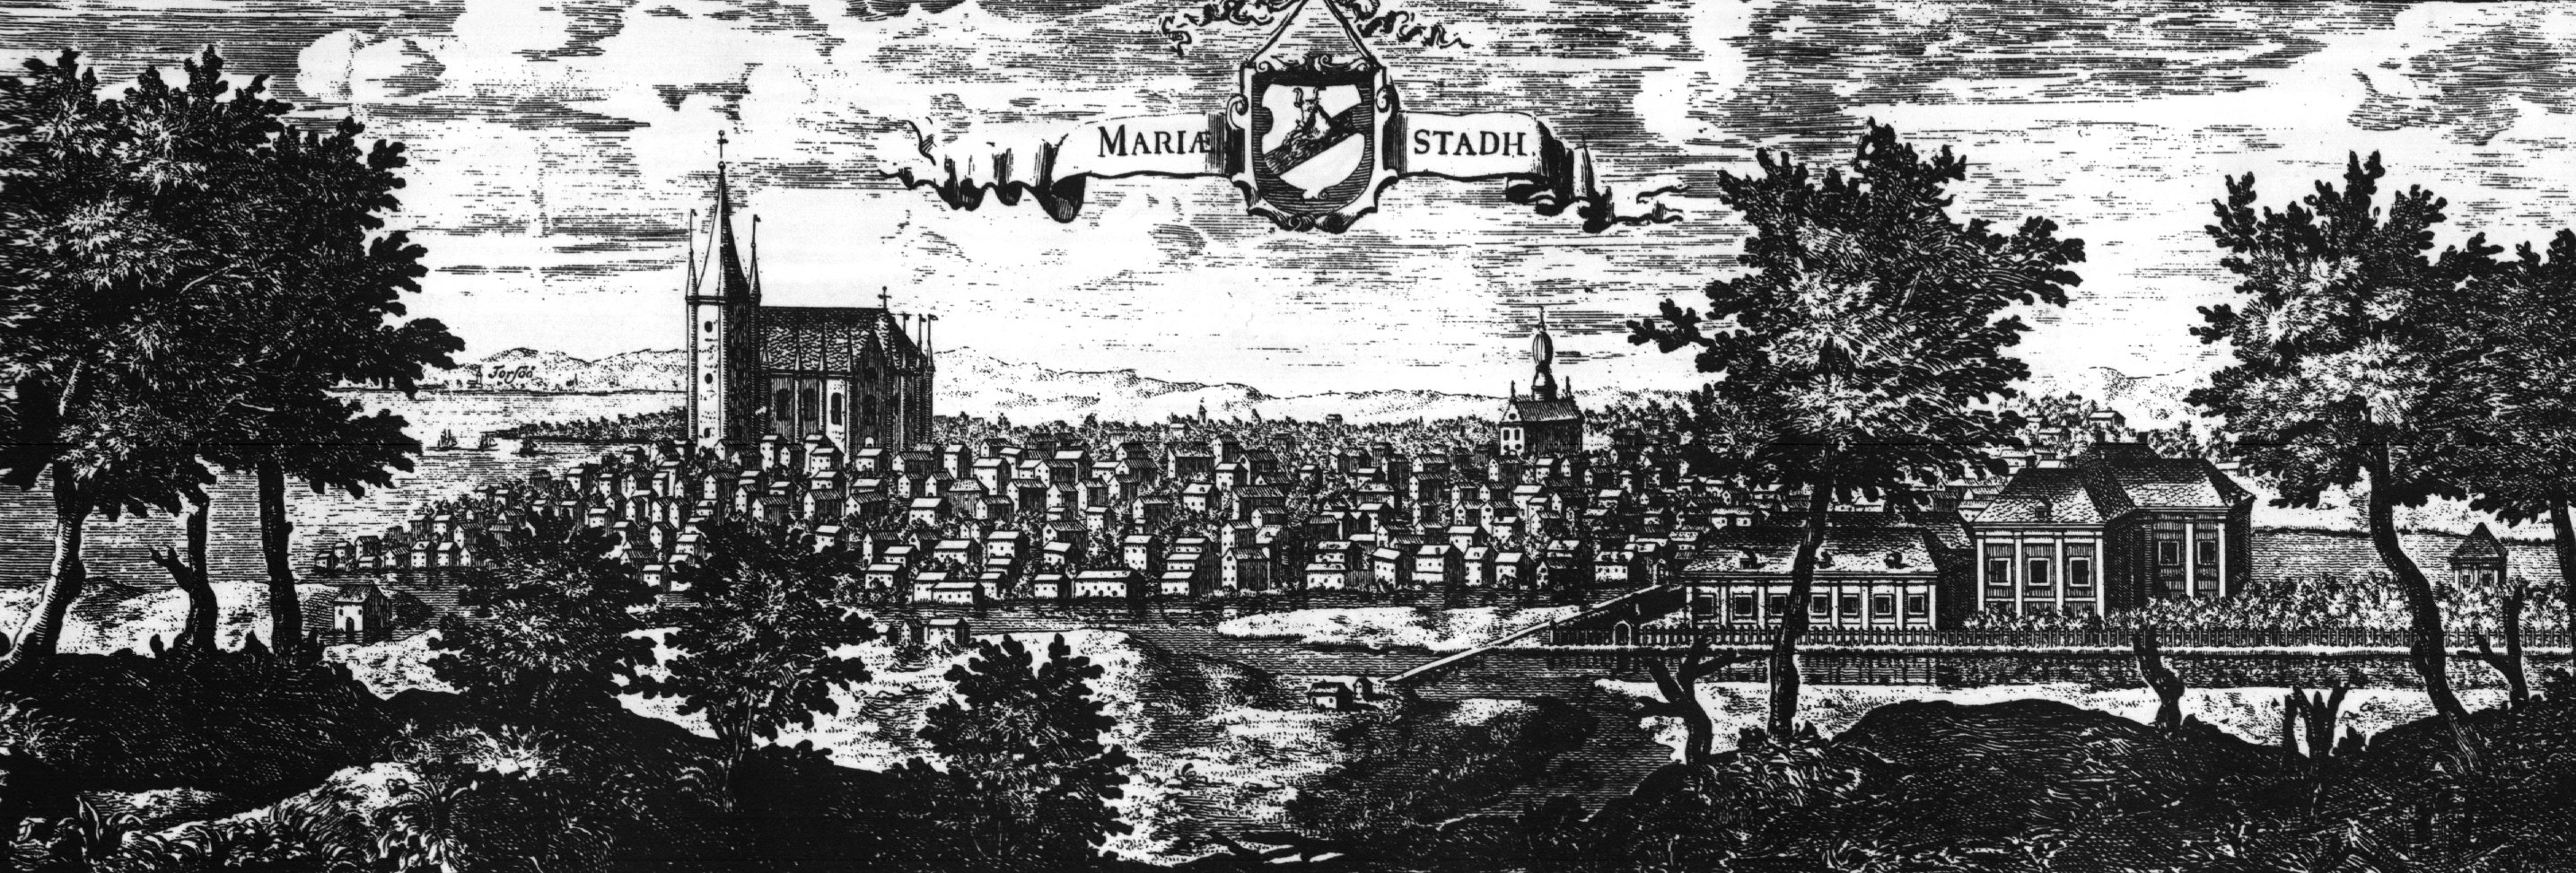 1646 in Sweden